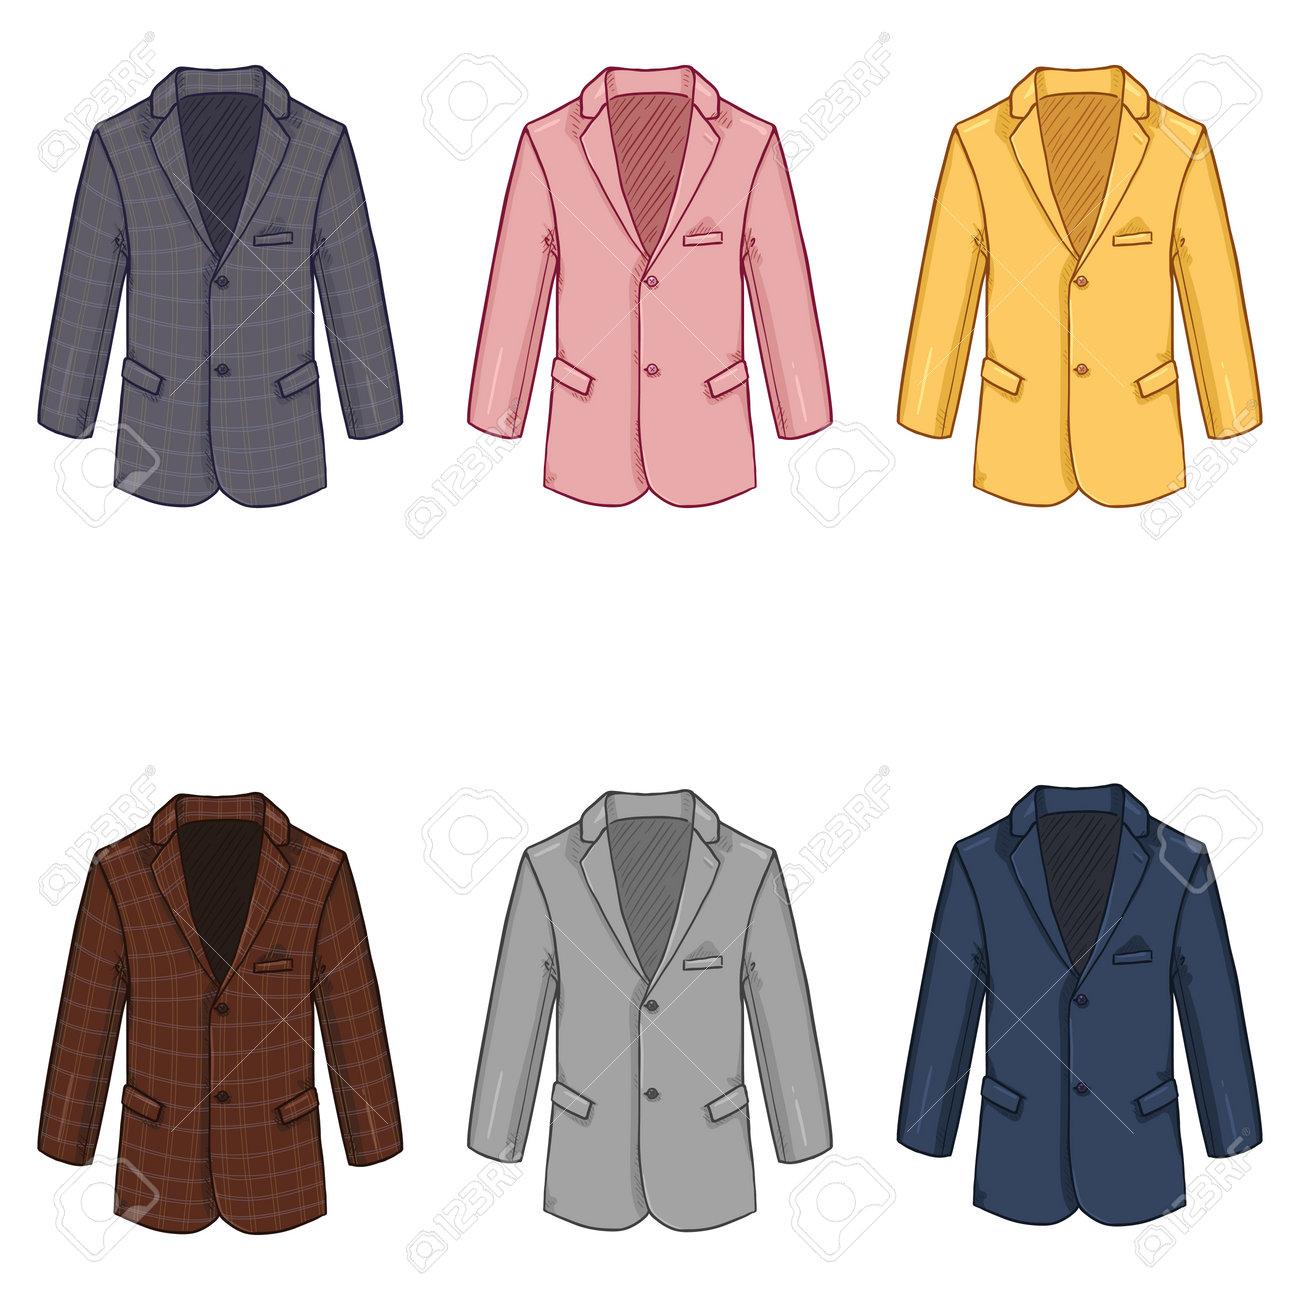 Vector Set of Cartoon Blazers. Color Variations of Suit Jacket - 169663654